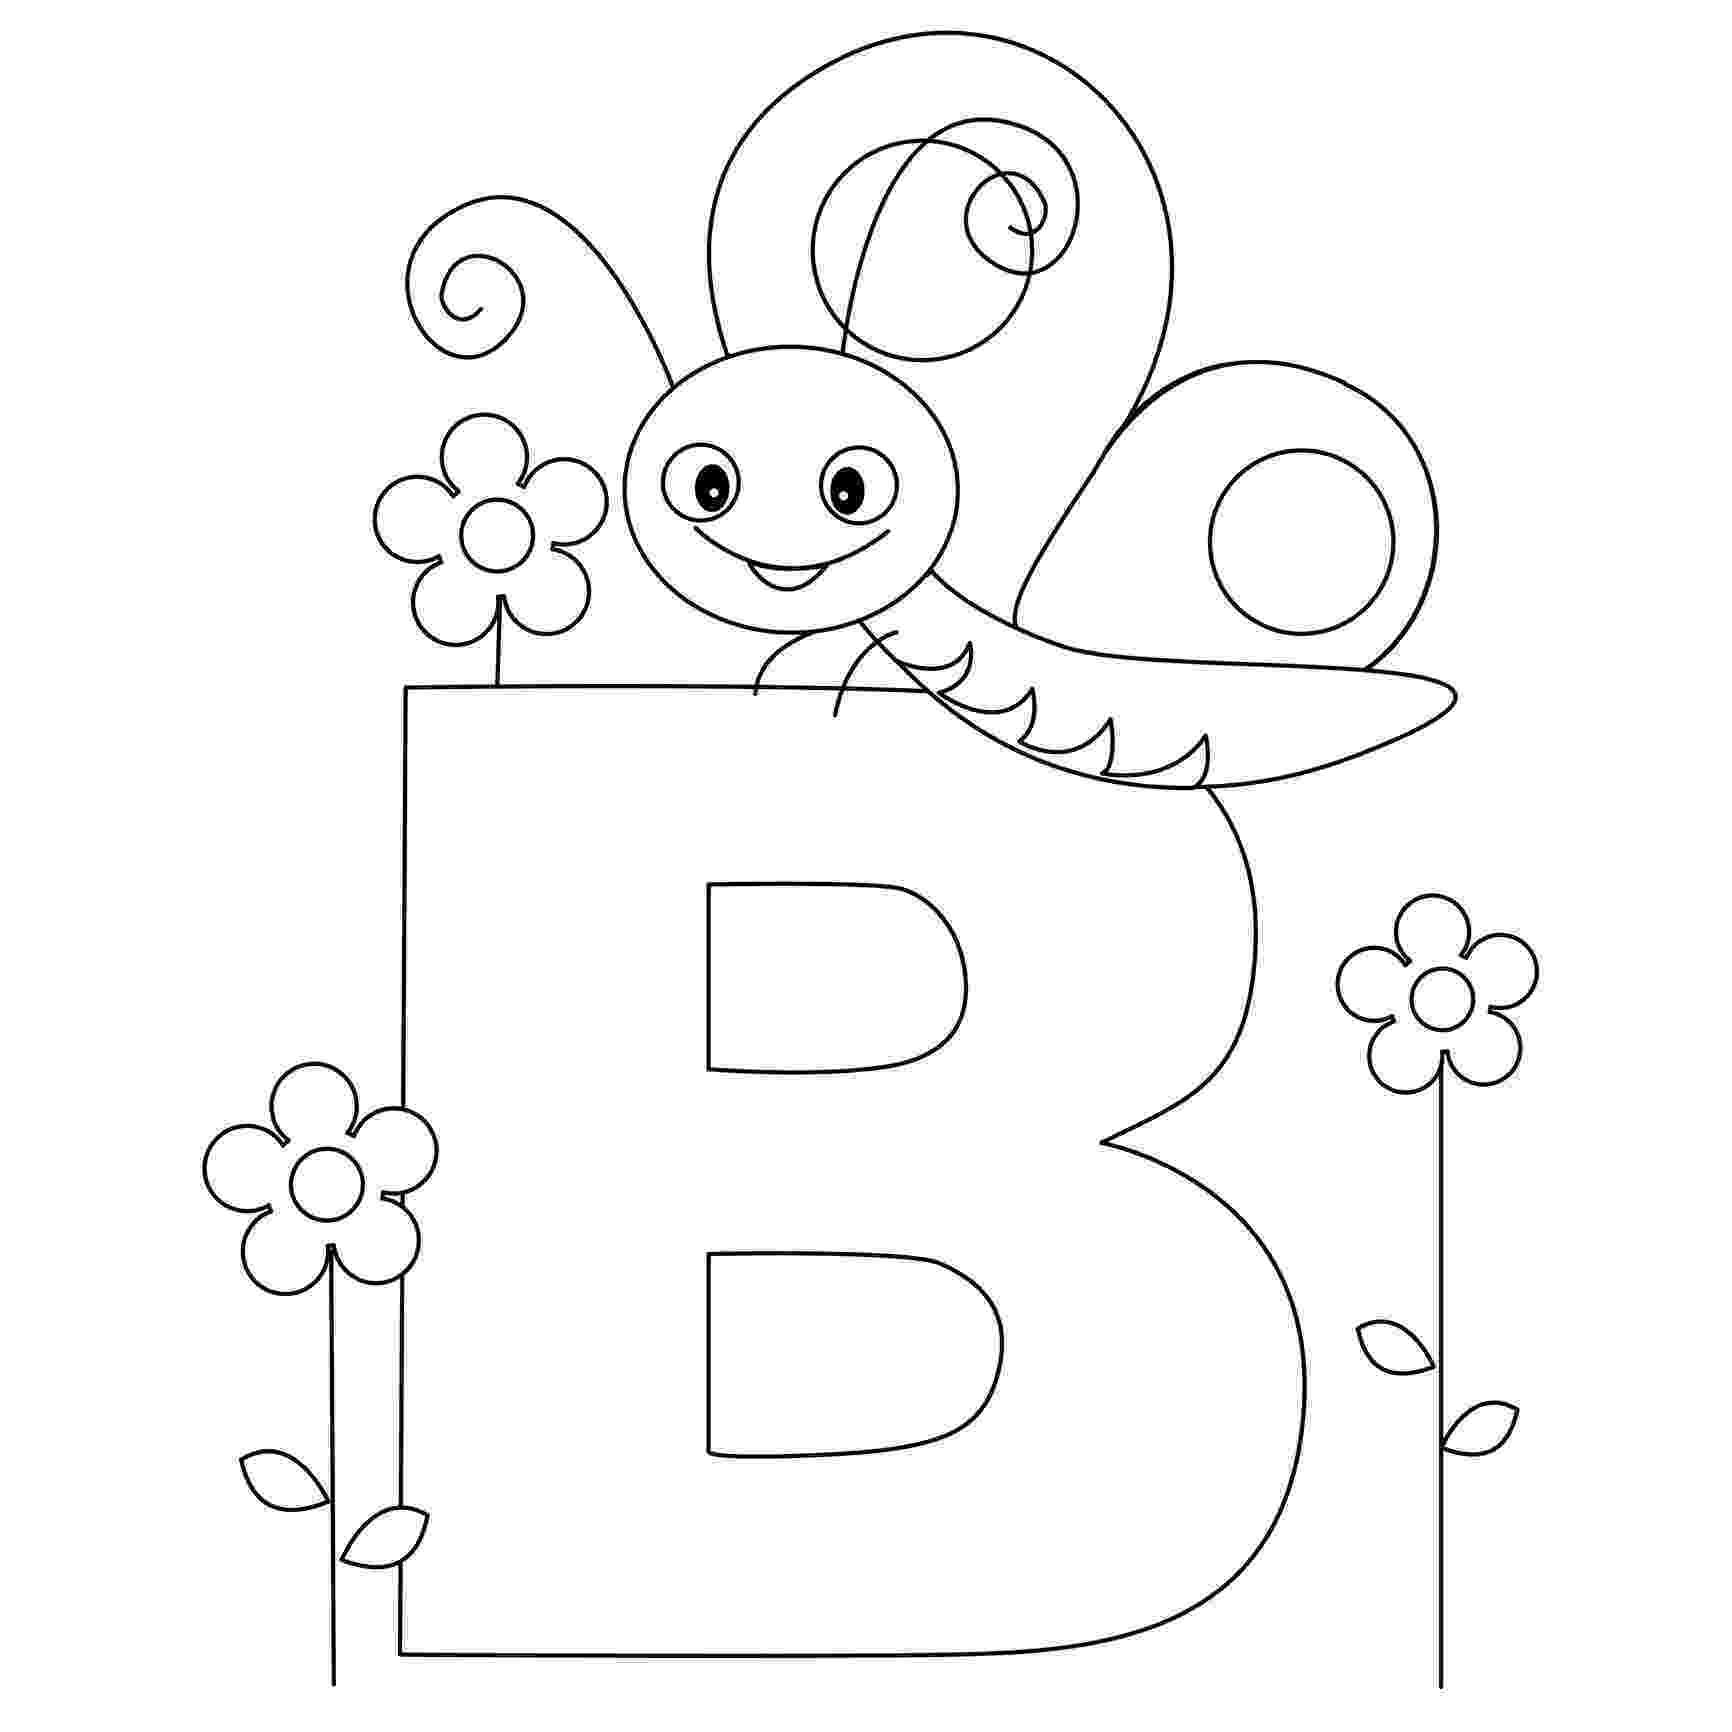 abc coloring sheets free printable alphabet coloring pages for kids best abc sheets coloring